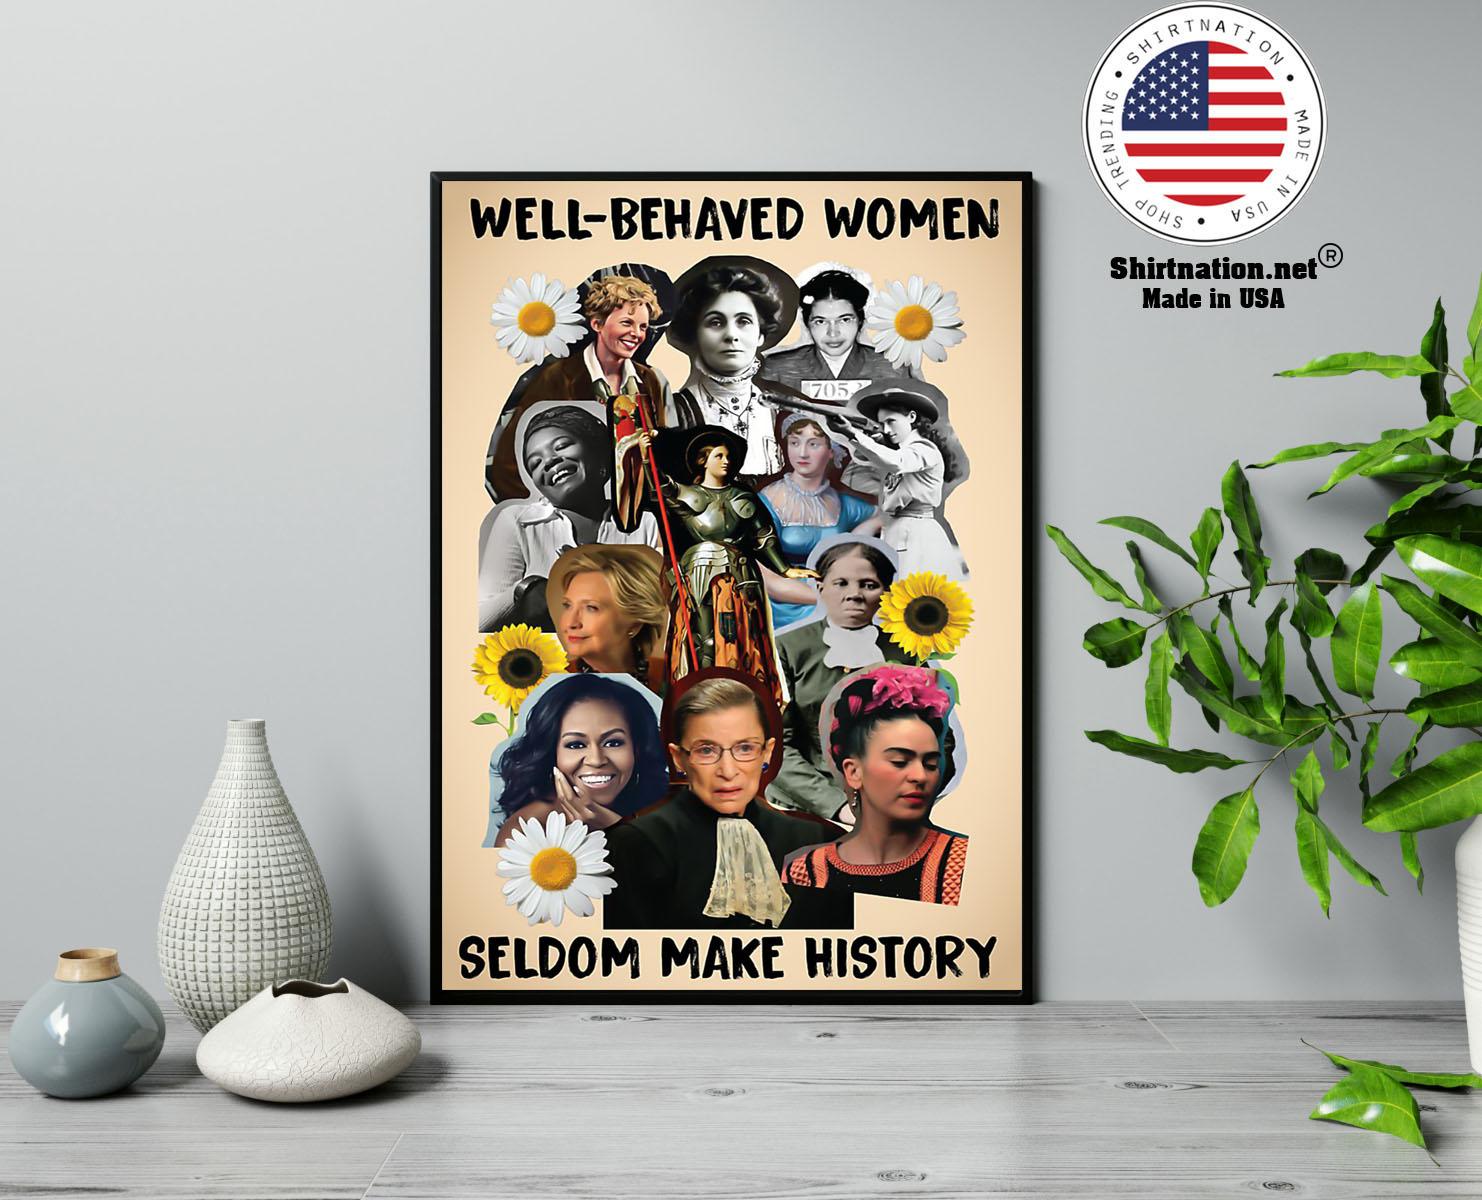 Well behaved women seldom make history poster 13